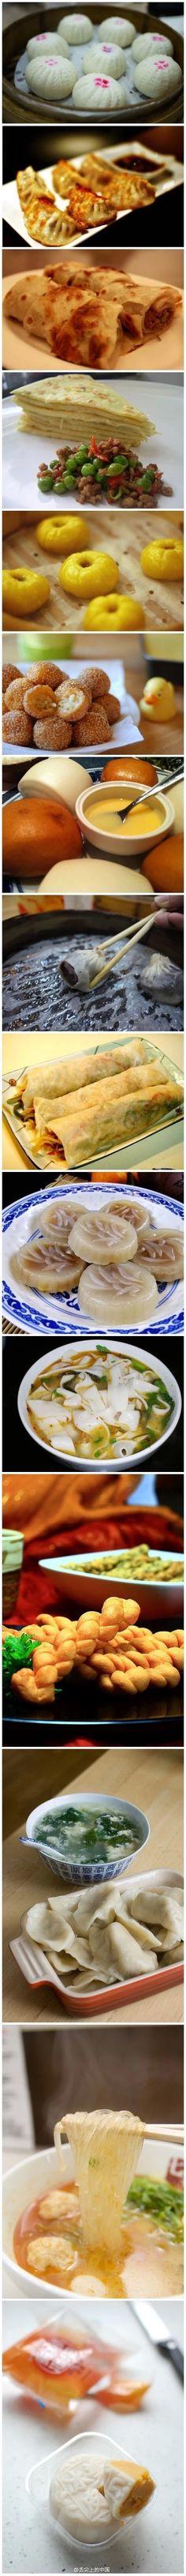 Chinese snacks http://www.mkspecials.com/  http://www.kickscenter.com